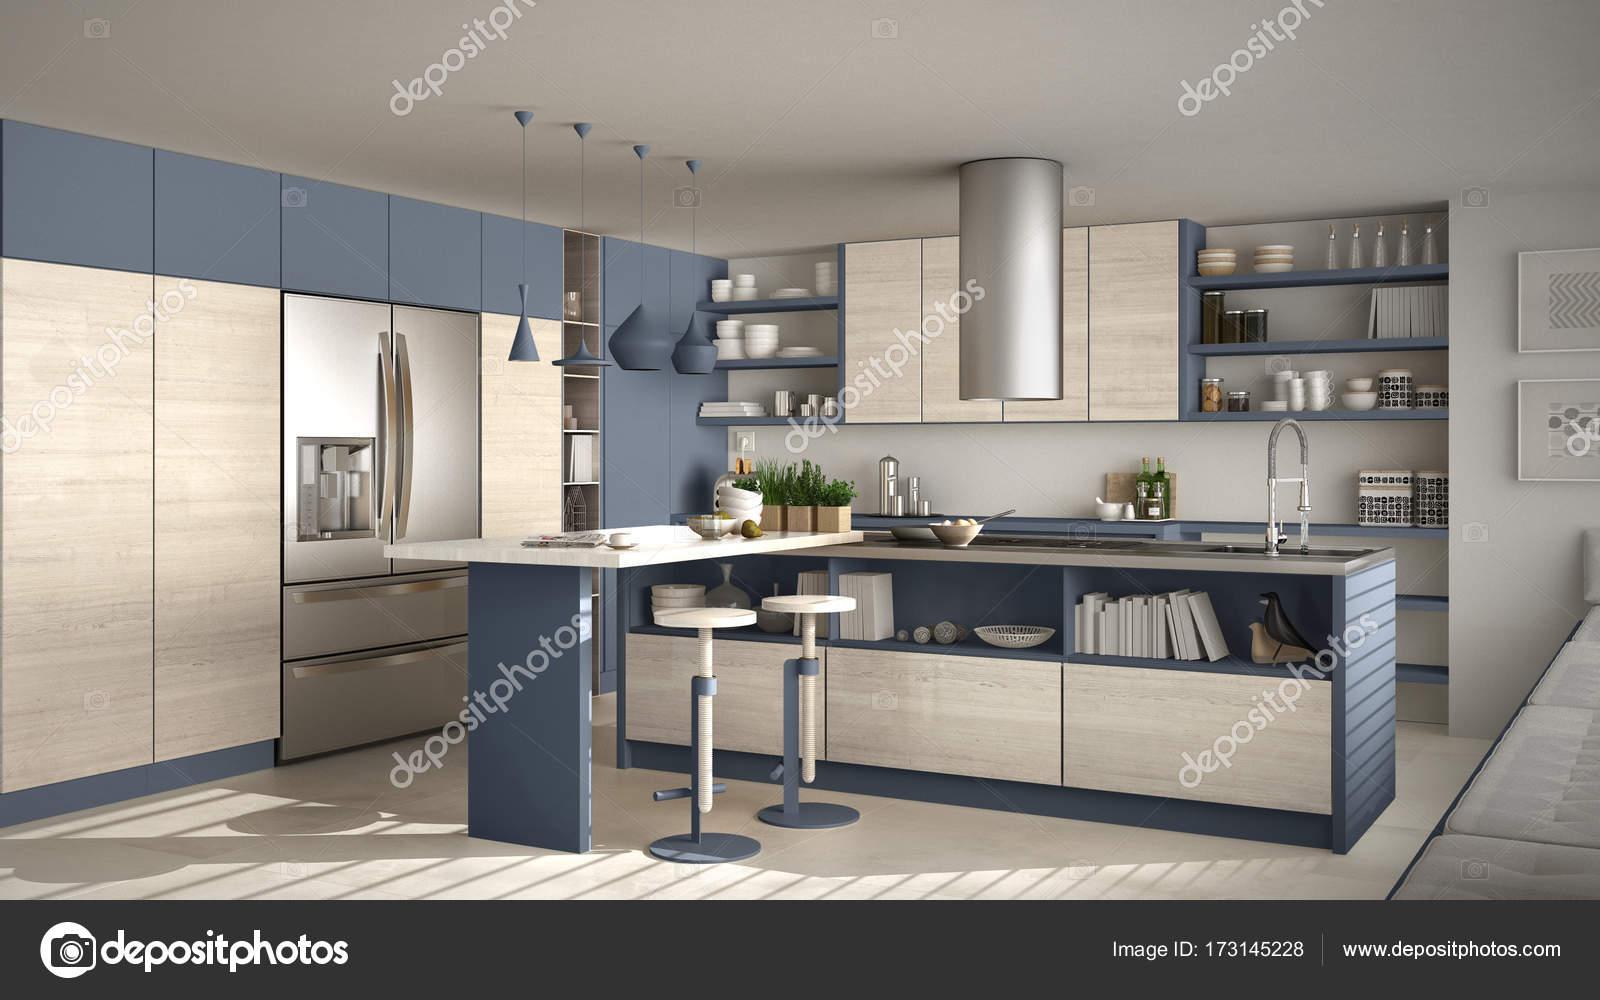 https://st3.depositphotos.com/1152281/17314/i/1600/depositphotos_173145228-stock-photo-modern-wooden-kitchen-with-wooden.jpg